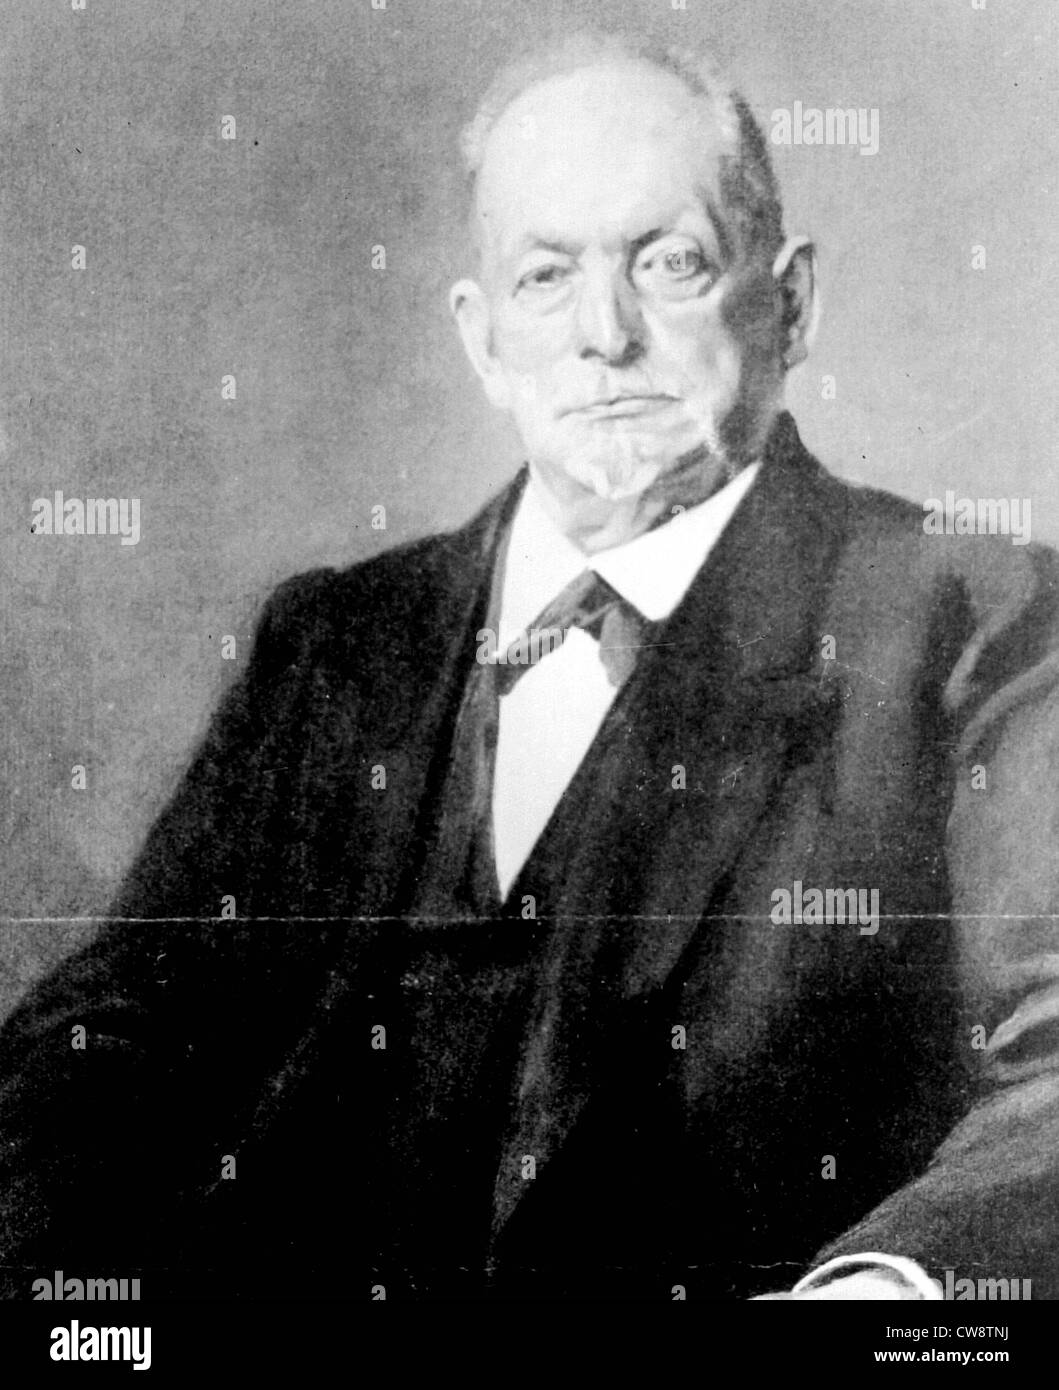 Mr. Auguste Thyssens - Stock Image